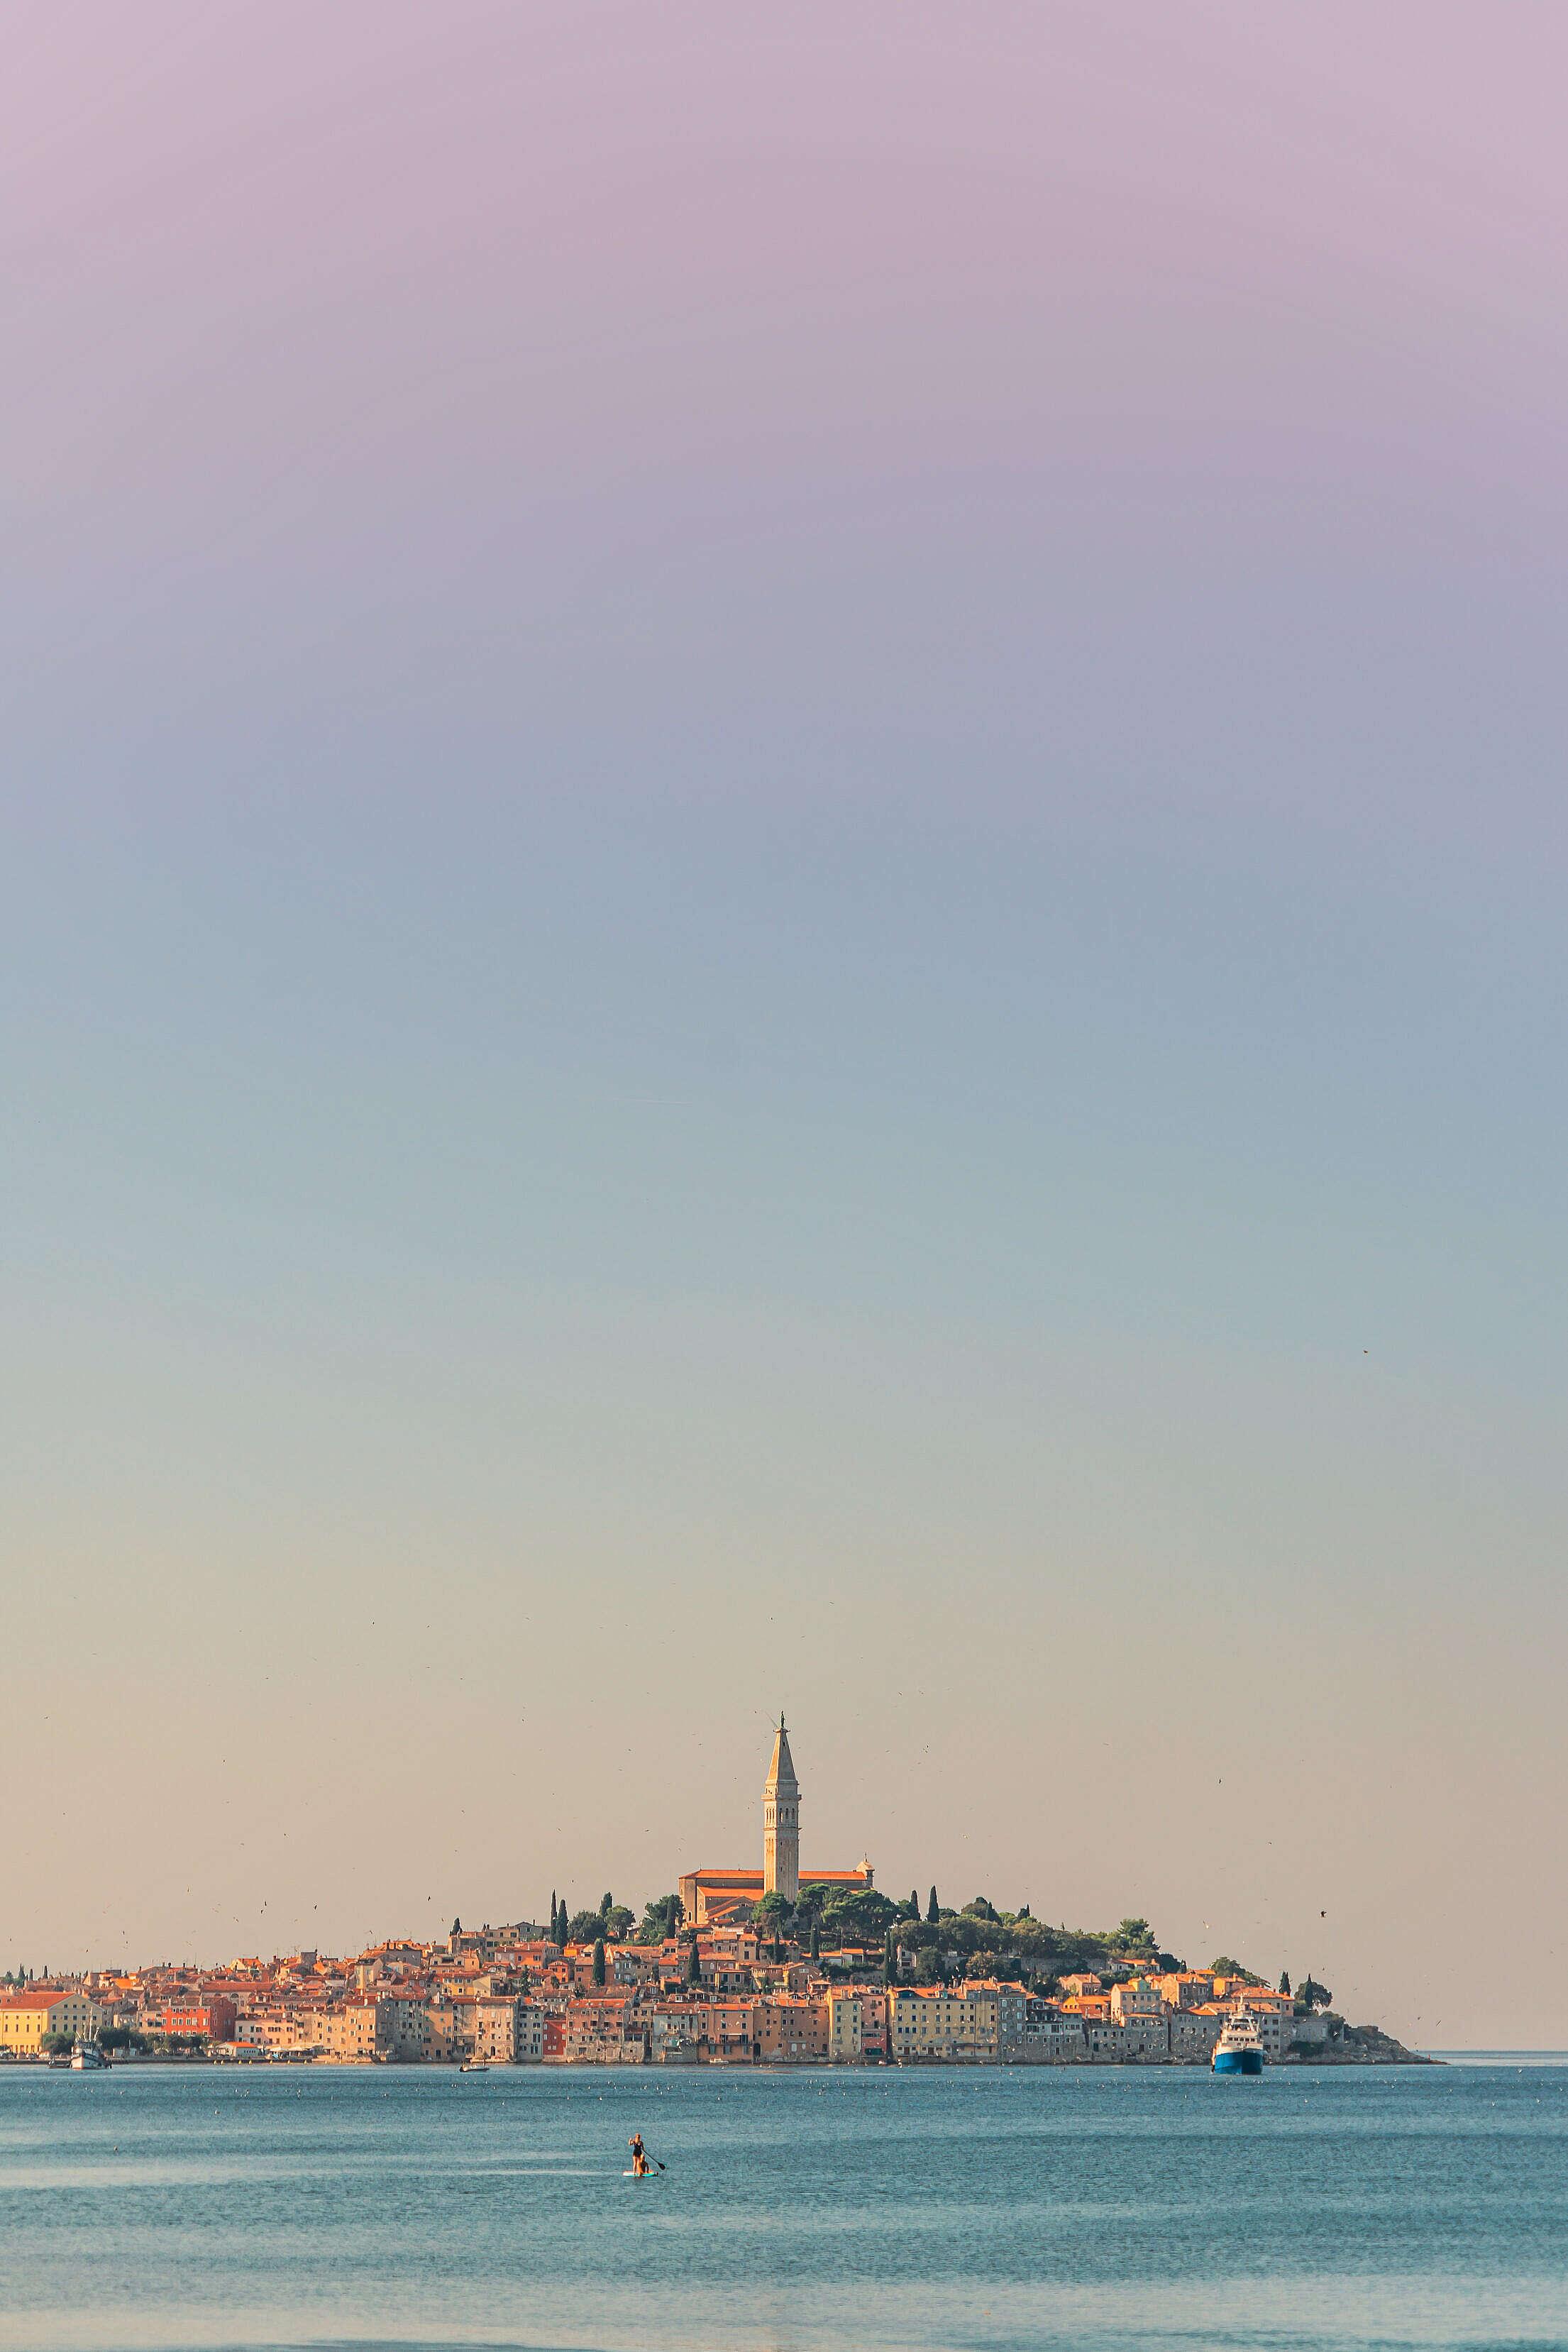 Beautiful Rovinj City in Croatia Free Stock Photo